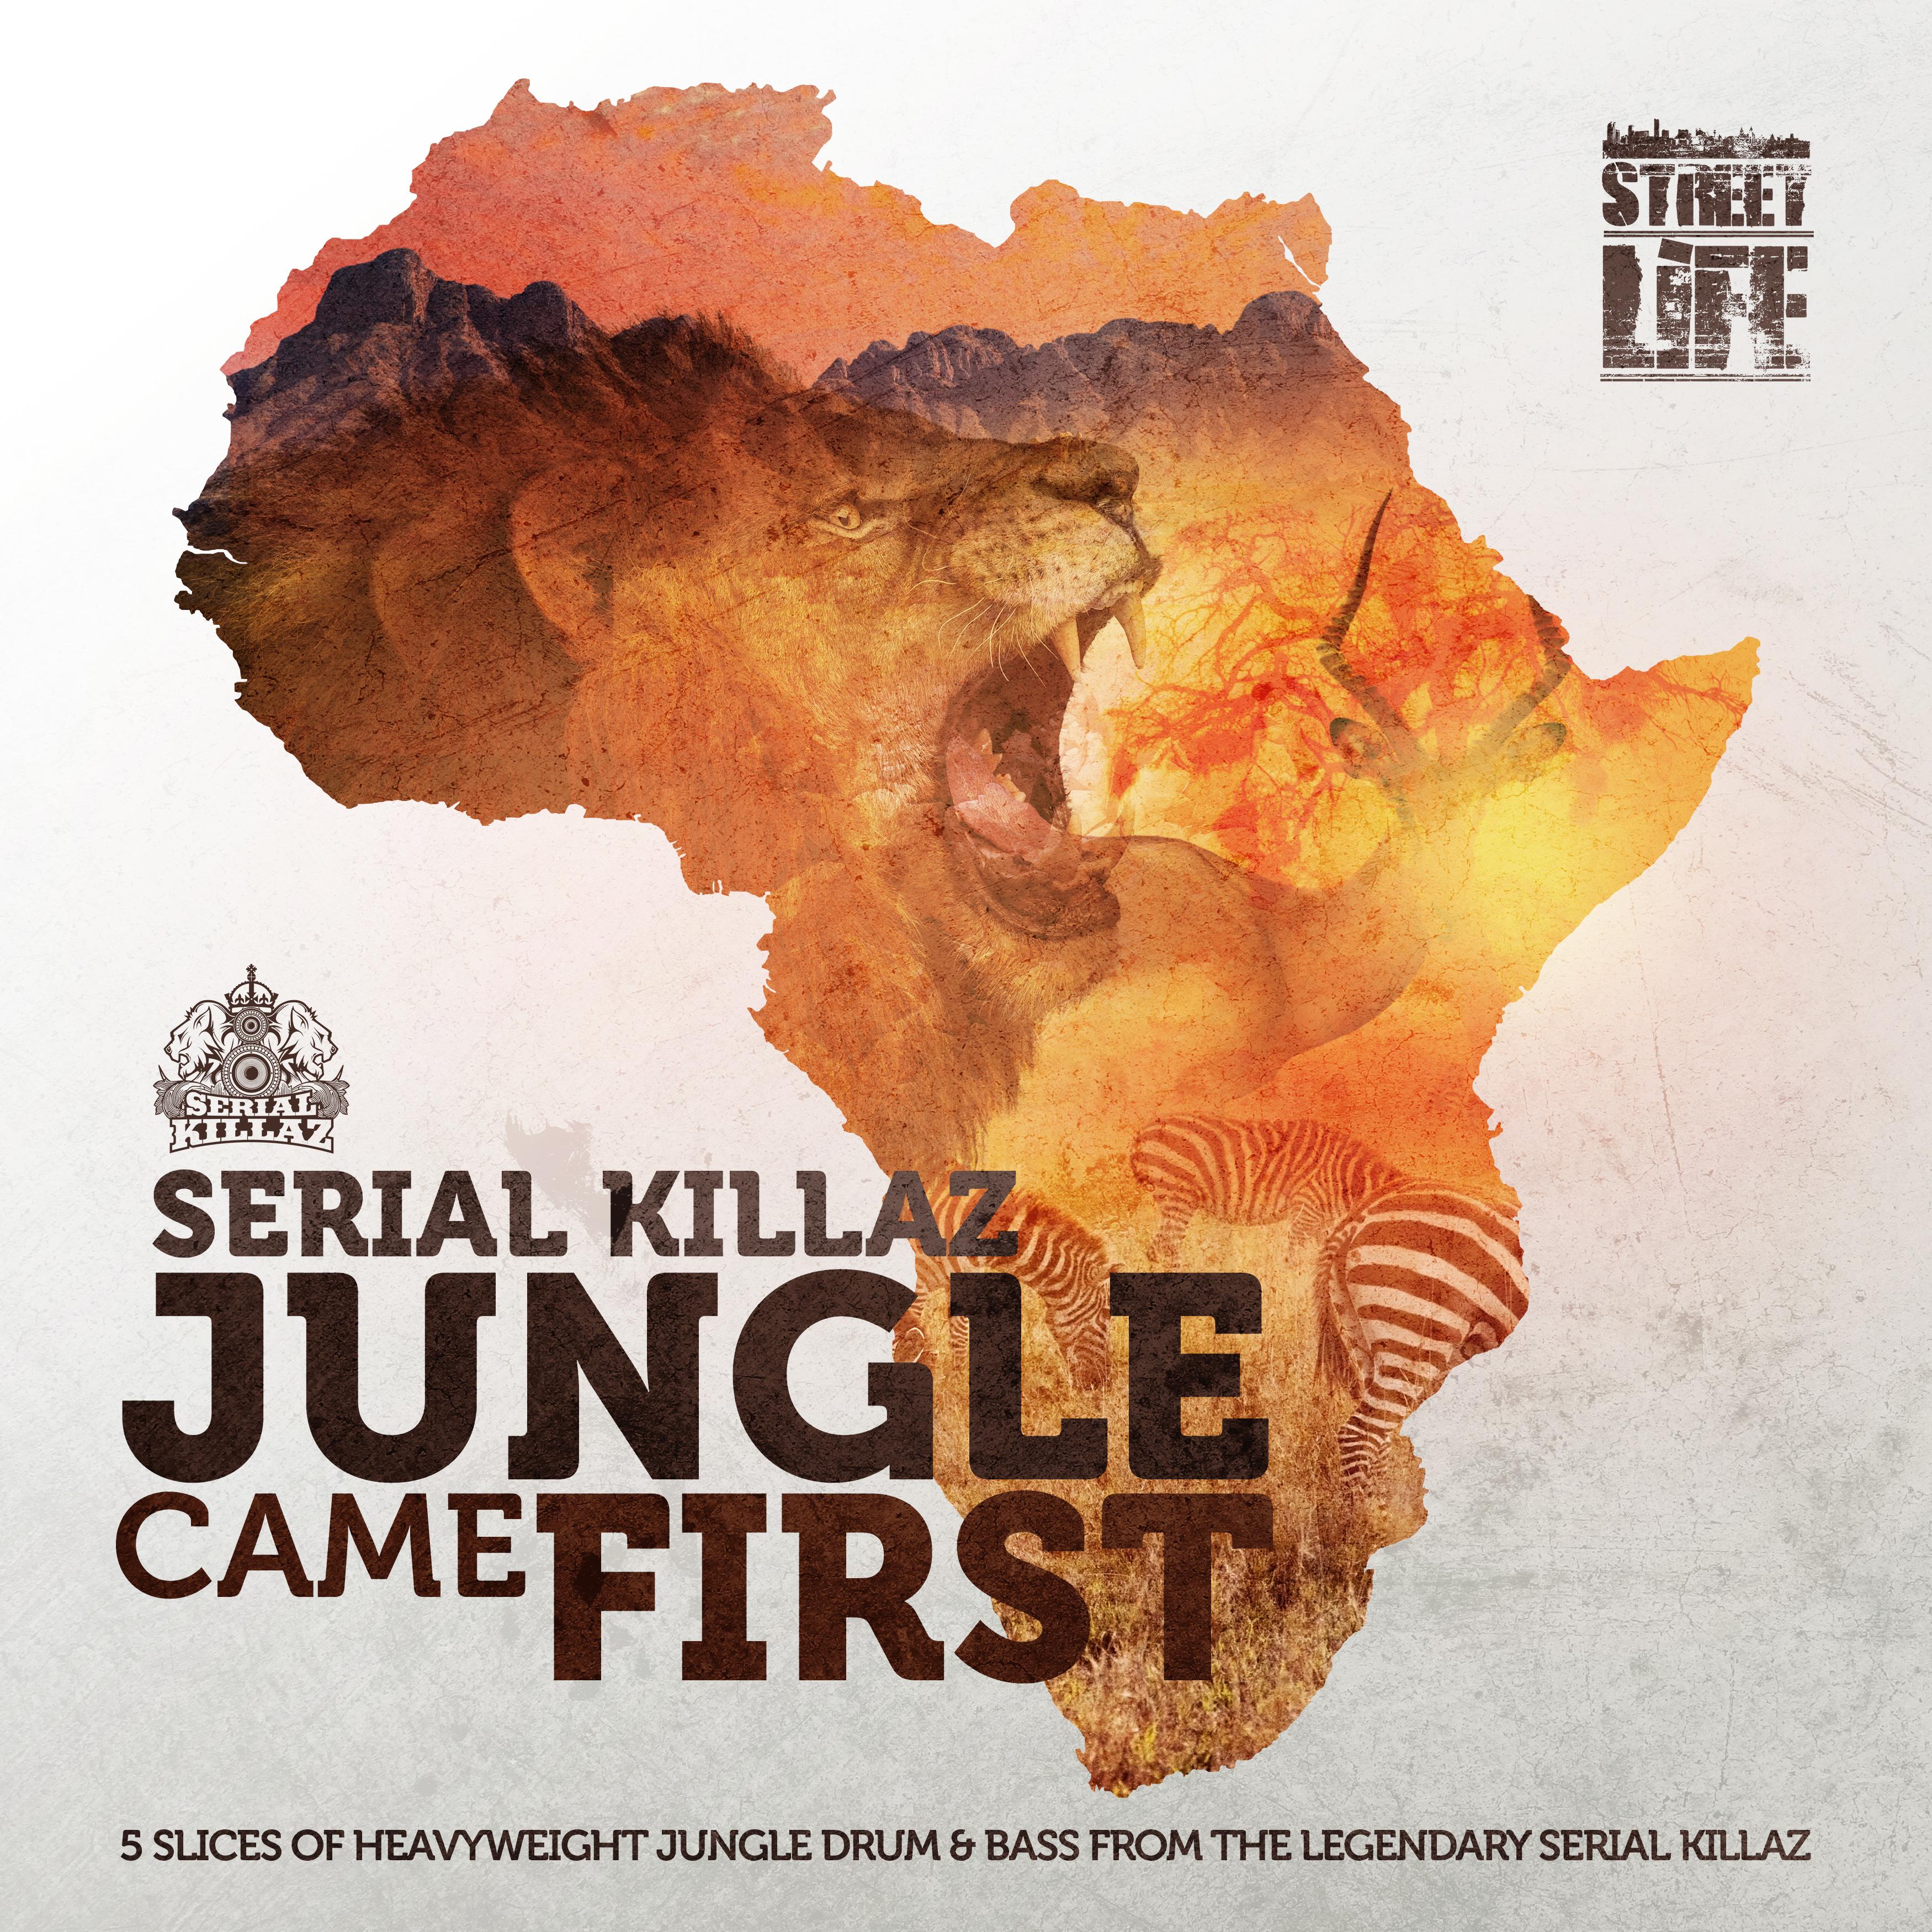 Serial Killaz - Jungle Came First EP